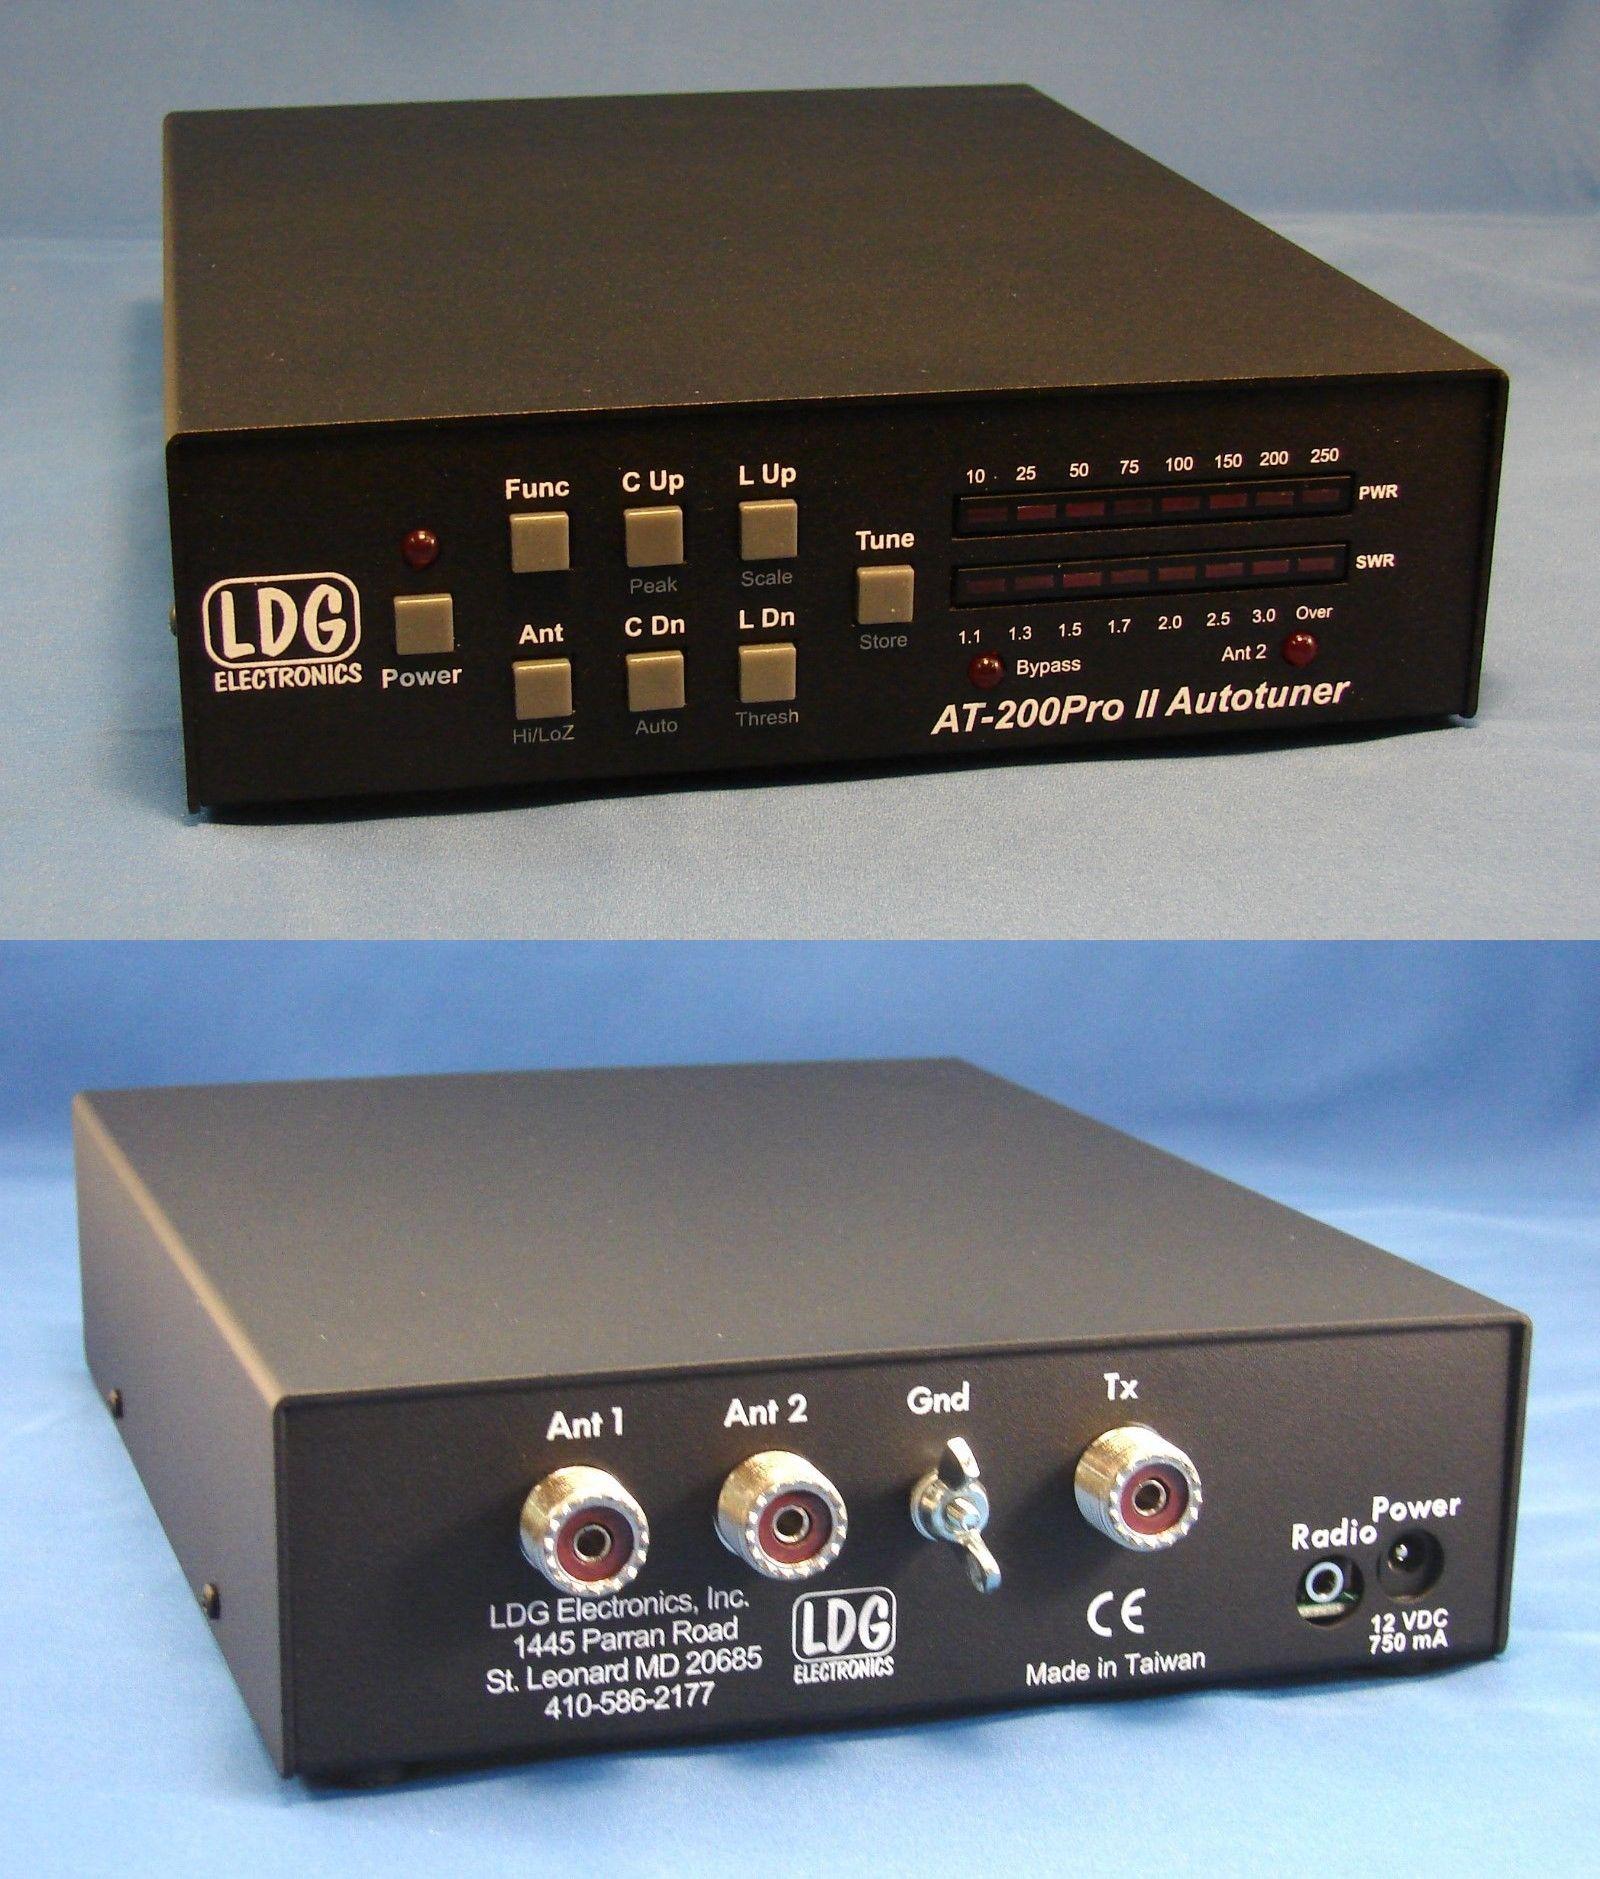 Ham Radio Equipment, Radios, Ebay, Hams, Electronics, Ham, Consumer  Electronics